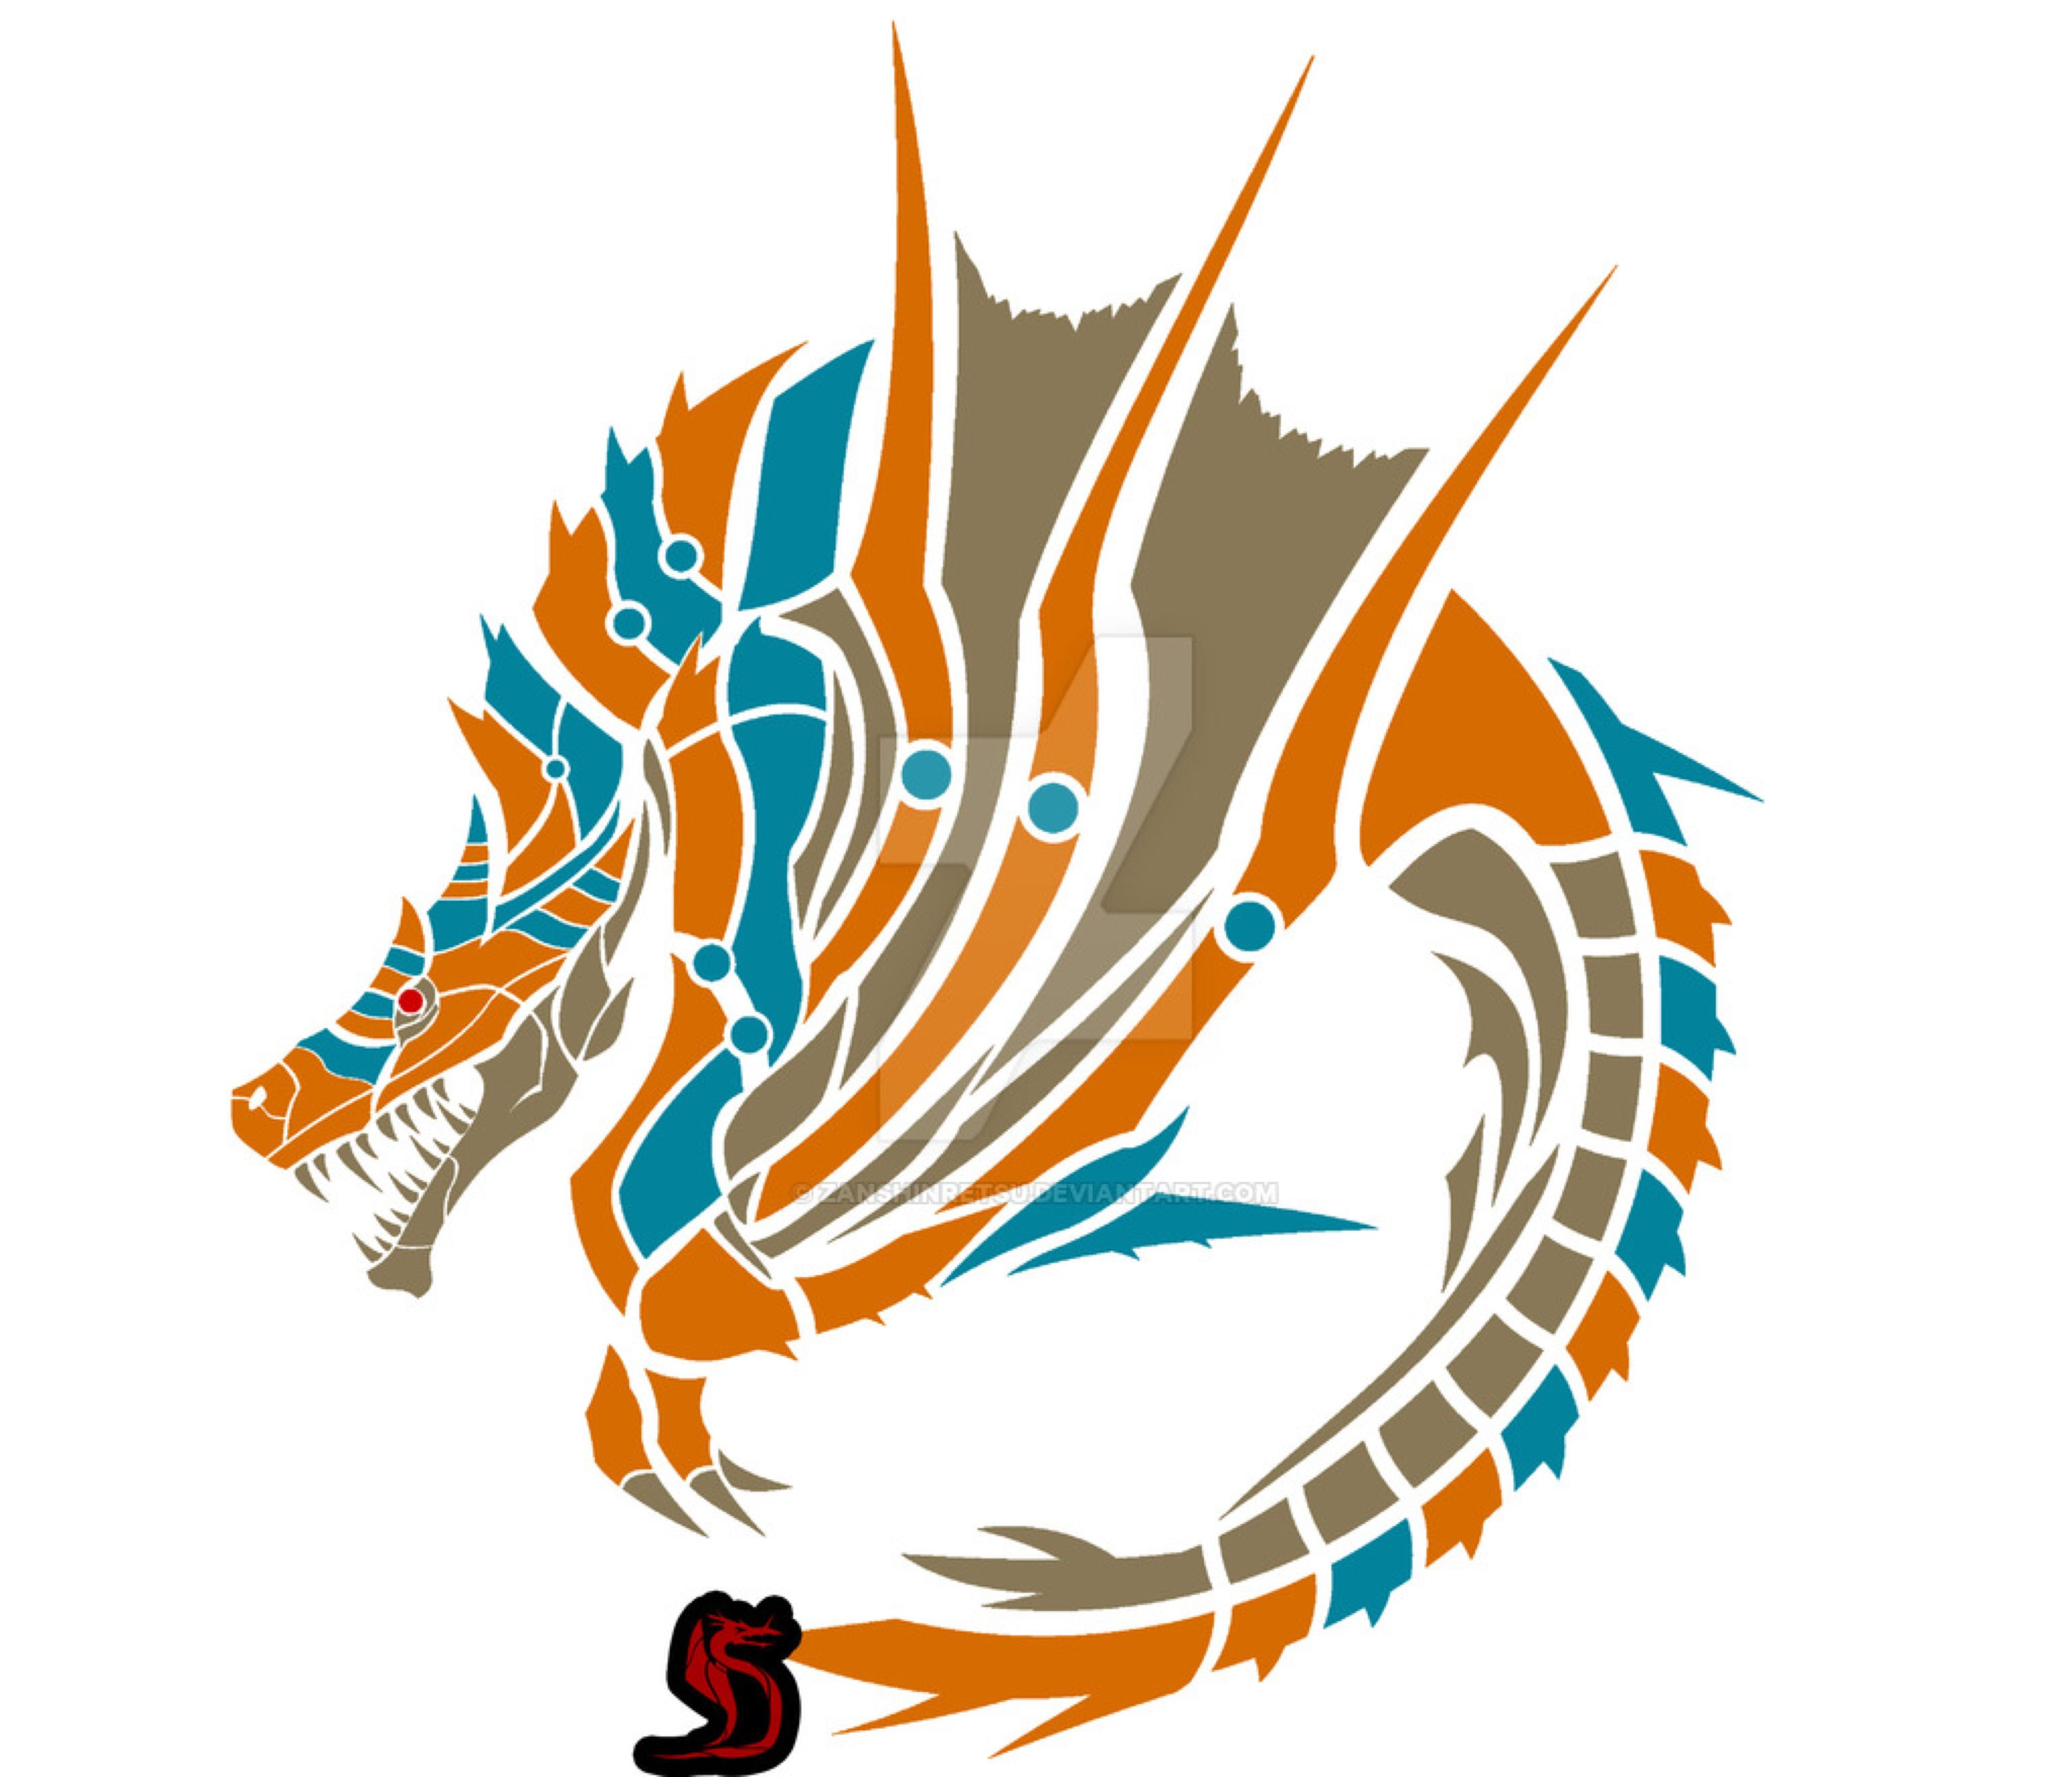 Tigrex Circular Emblem By Zanshinretsu On @DeviantArt